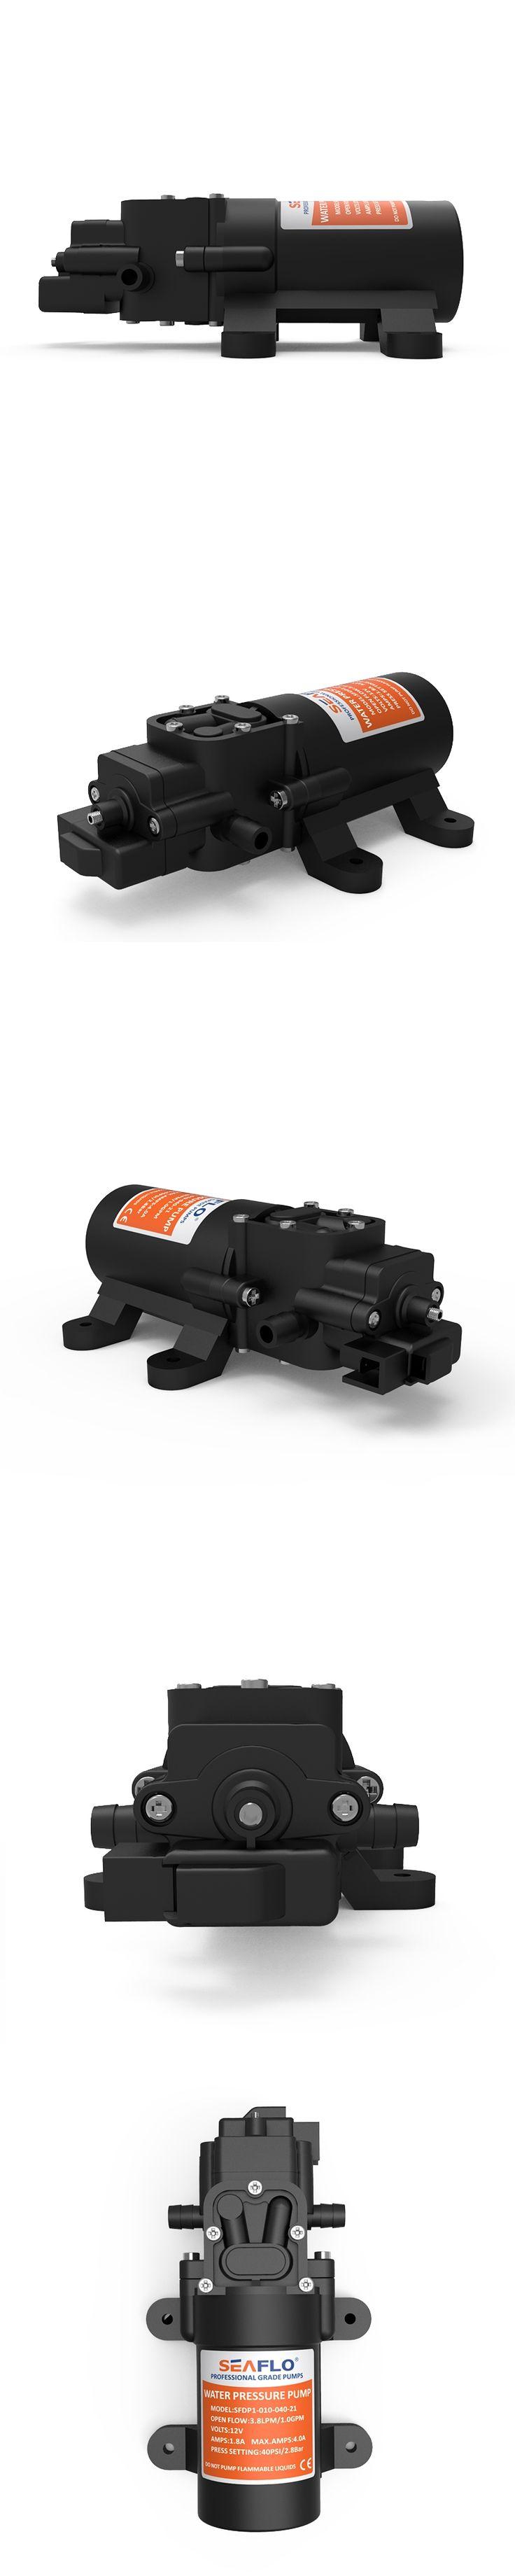 SEAFLO 12V DC Power 1.0GPM Water Pressure Pump System Diaphragm Pump Boat Marine RV